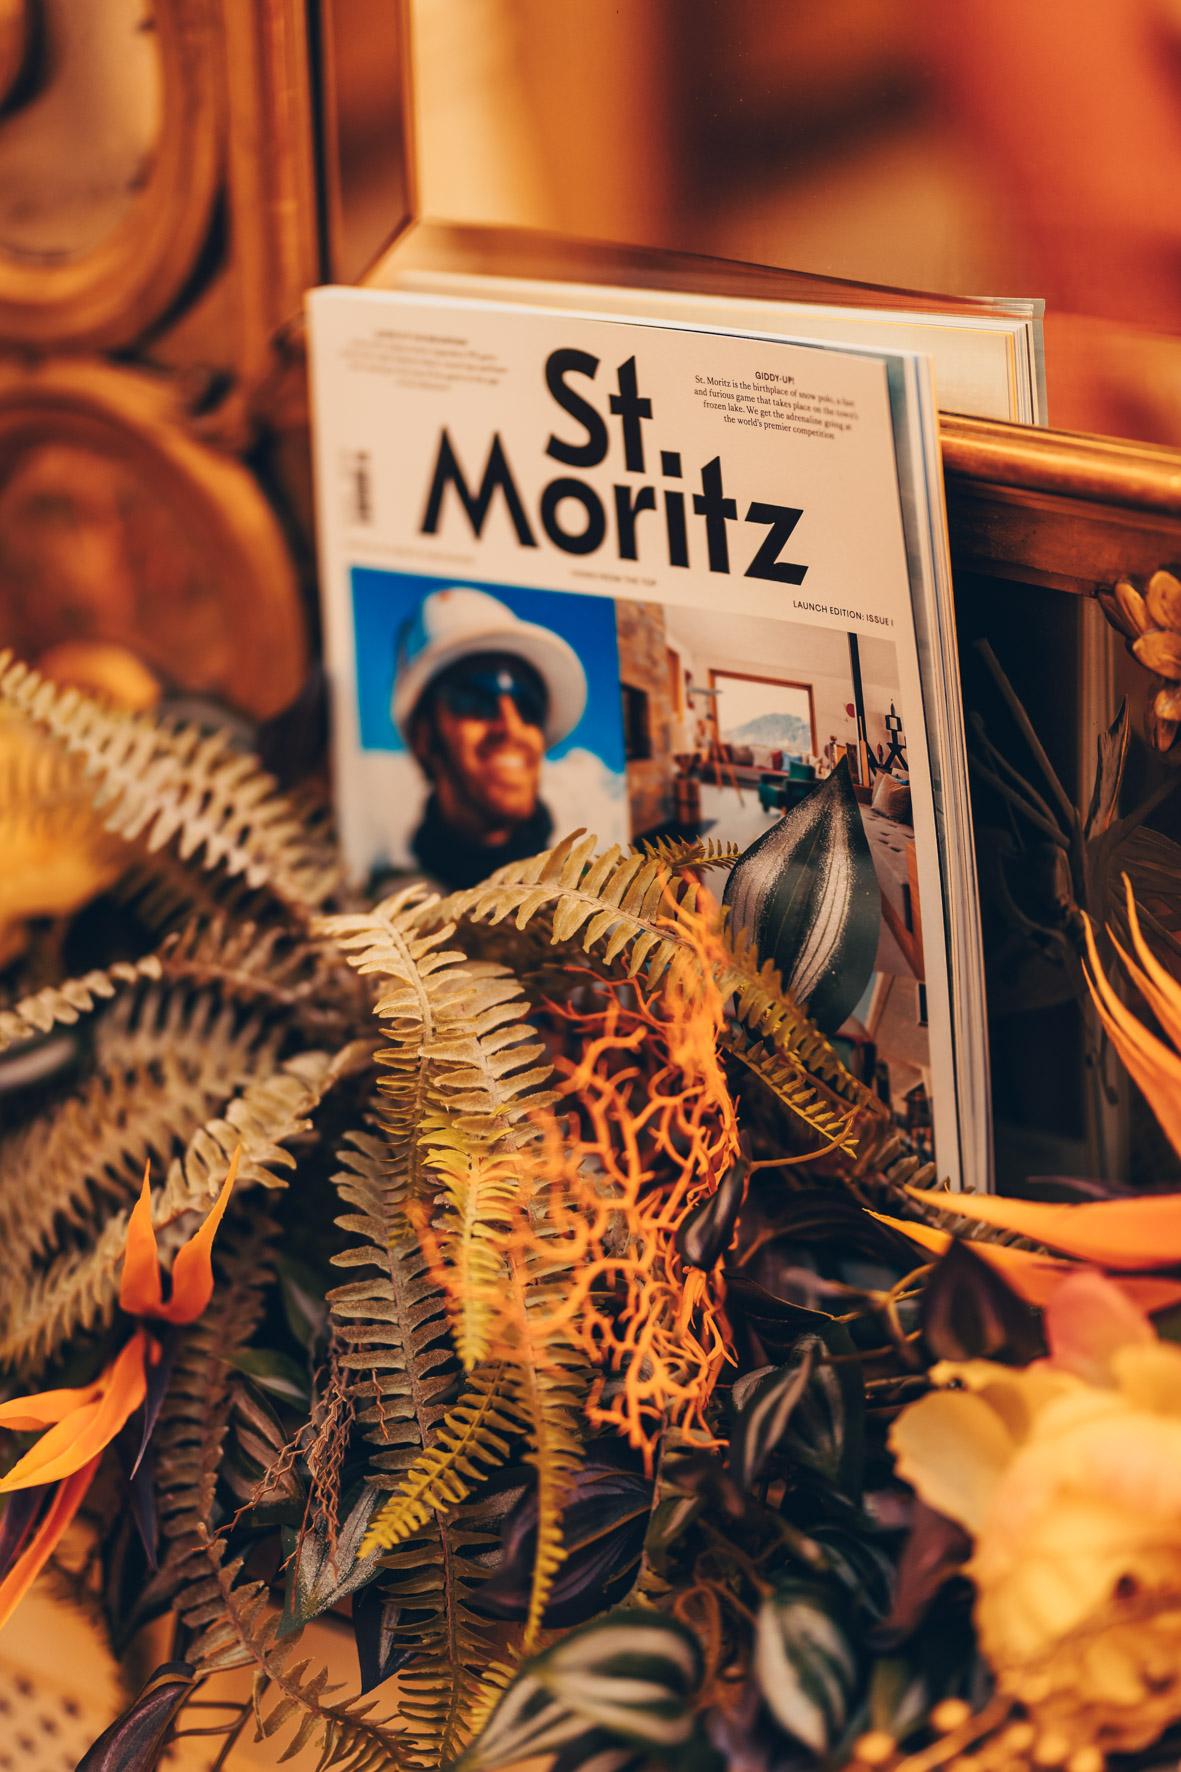 Konrad-lifestyle-art-basel-%22stmoritz%22-2019-78.jpg